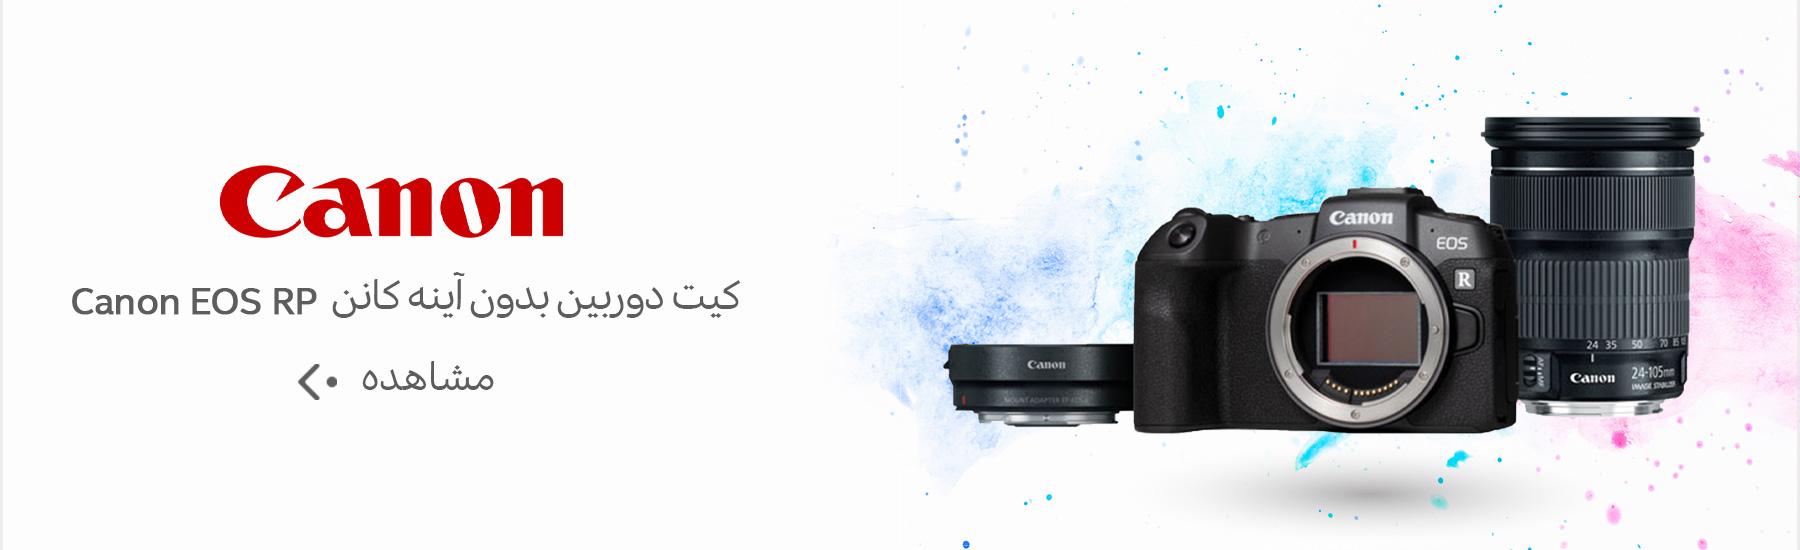 https://noornegar.com/product/canon-eos-rp-mount-adapter-ef-eos-r-ef-24-105mm/